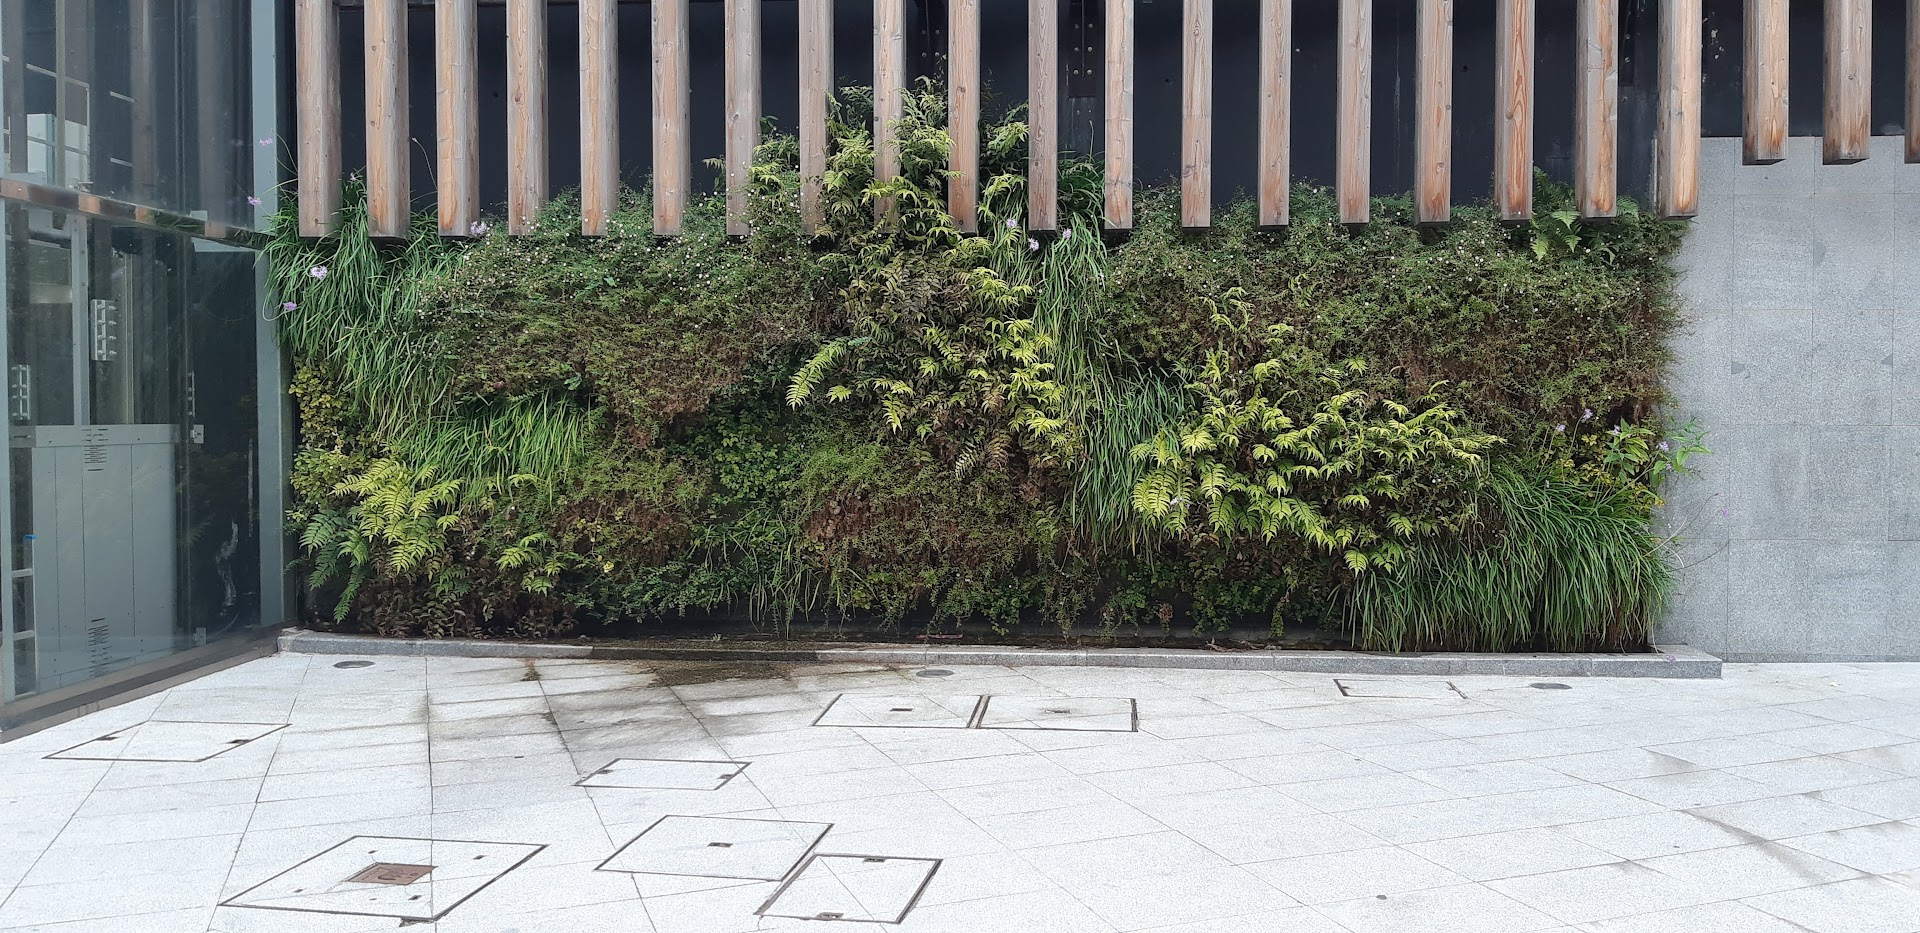 Jardín vertical en Bilbao en junio 2019